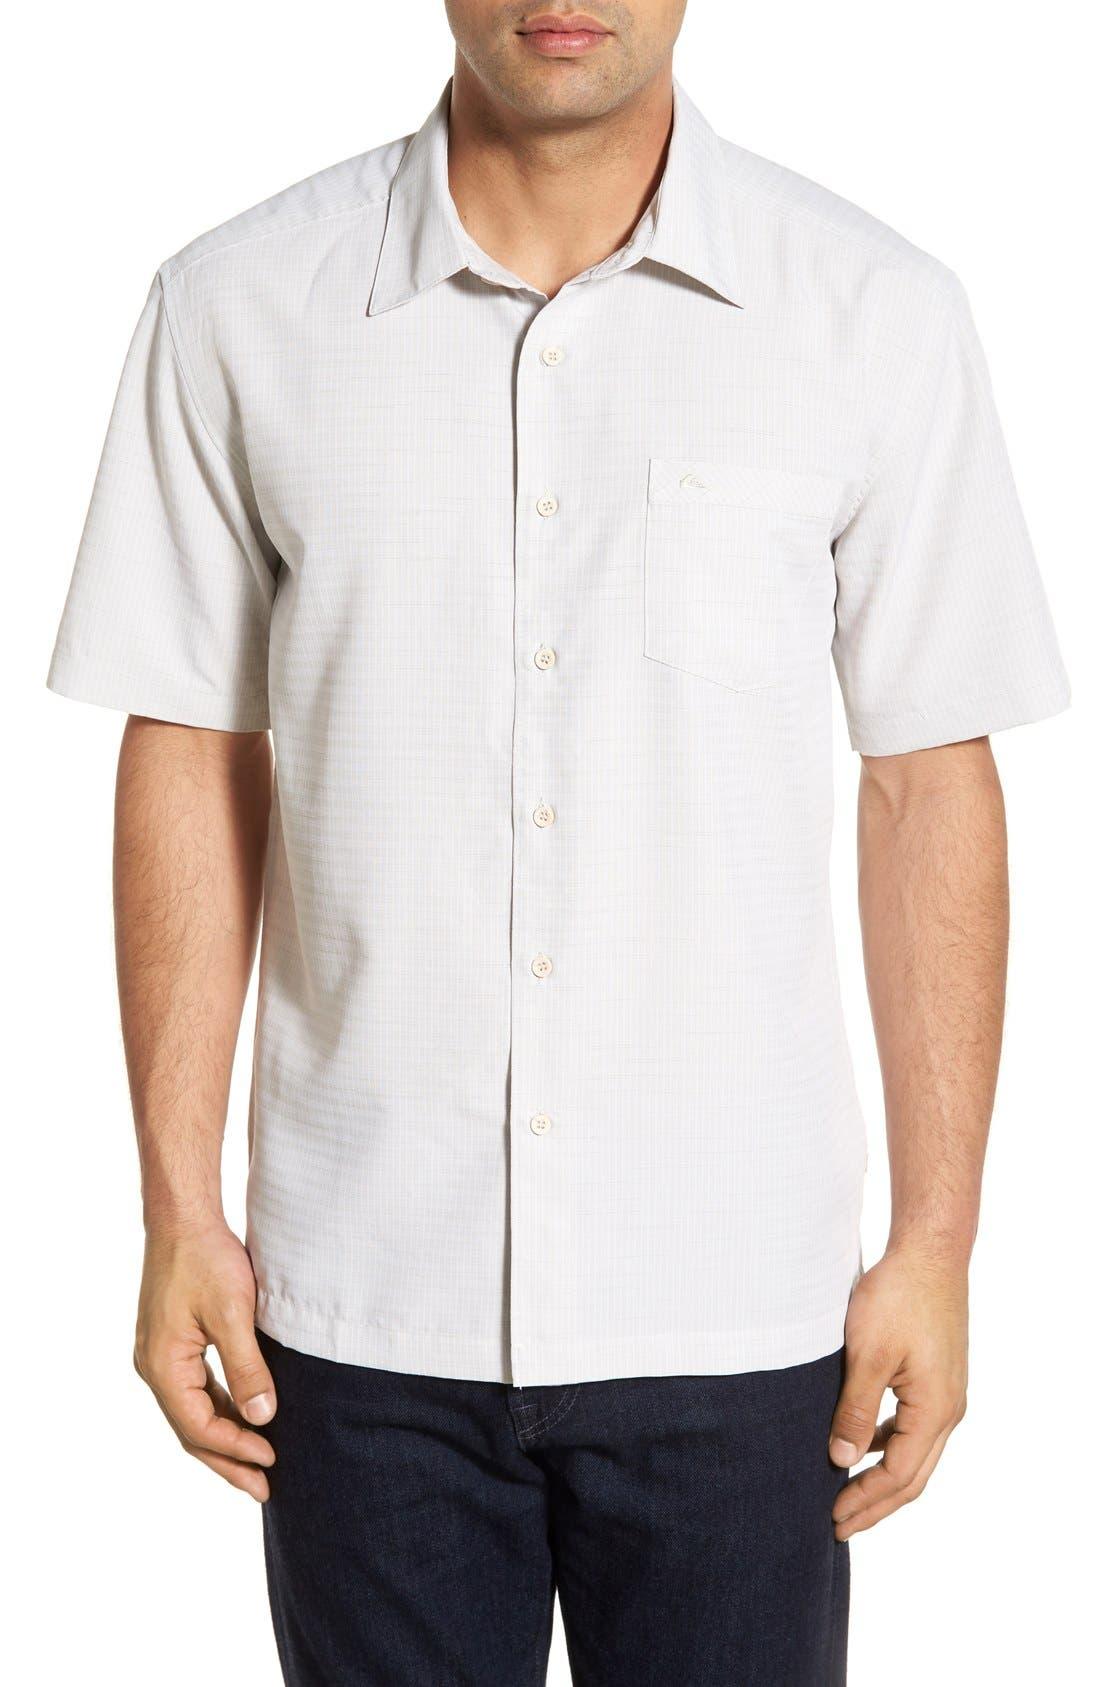 Main Image - Quiksilver Waterman Collection 'Centinela 4' Short Sleeve Sport Shirt